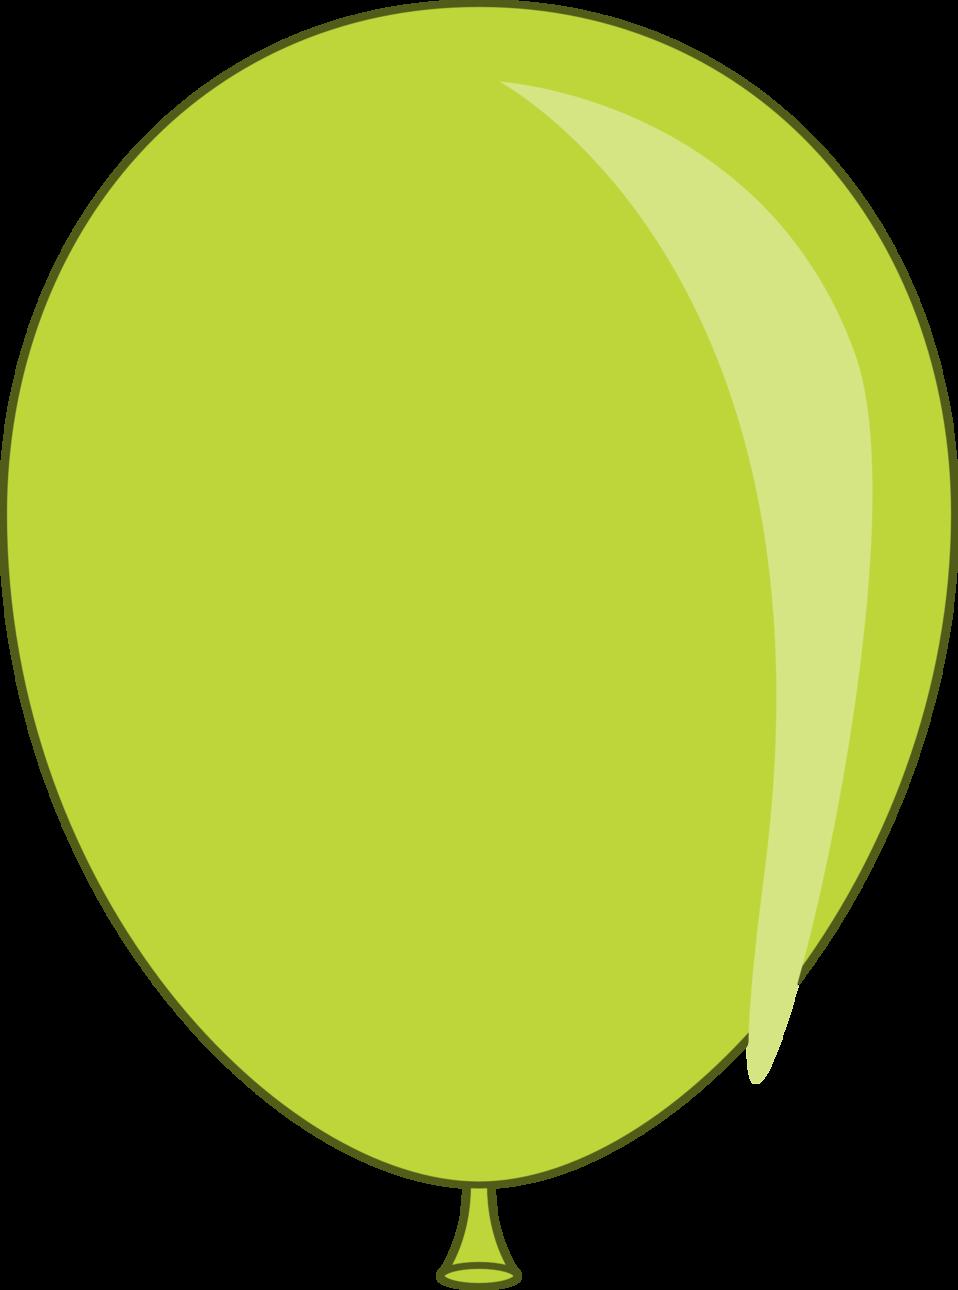 Public domain clip art. Clipart balloon yellow